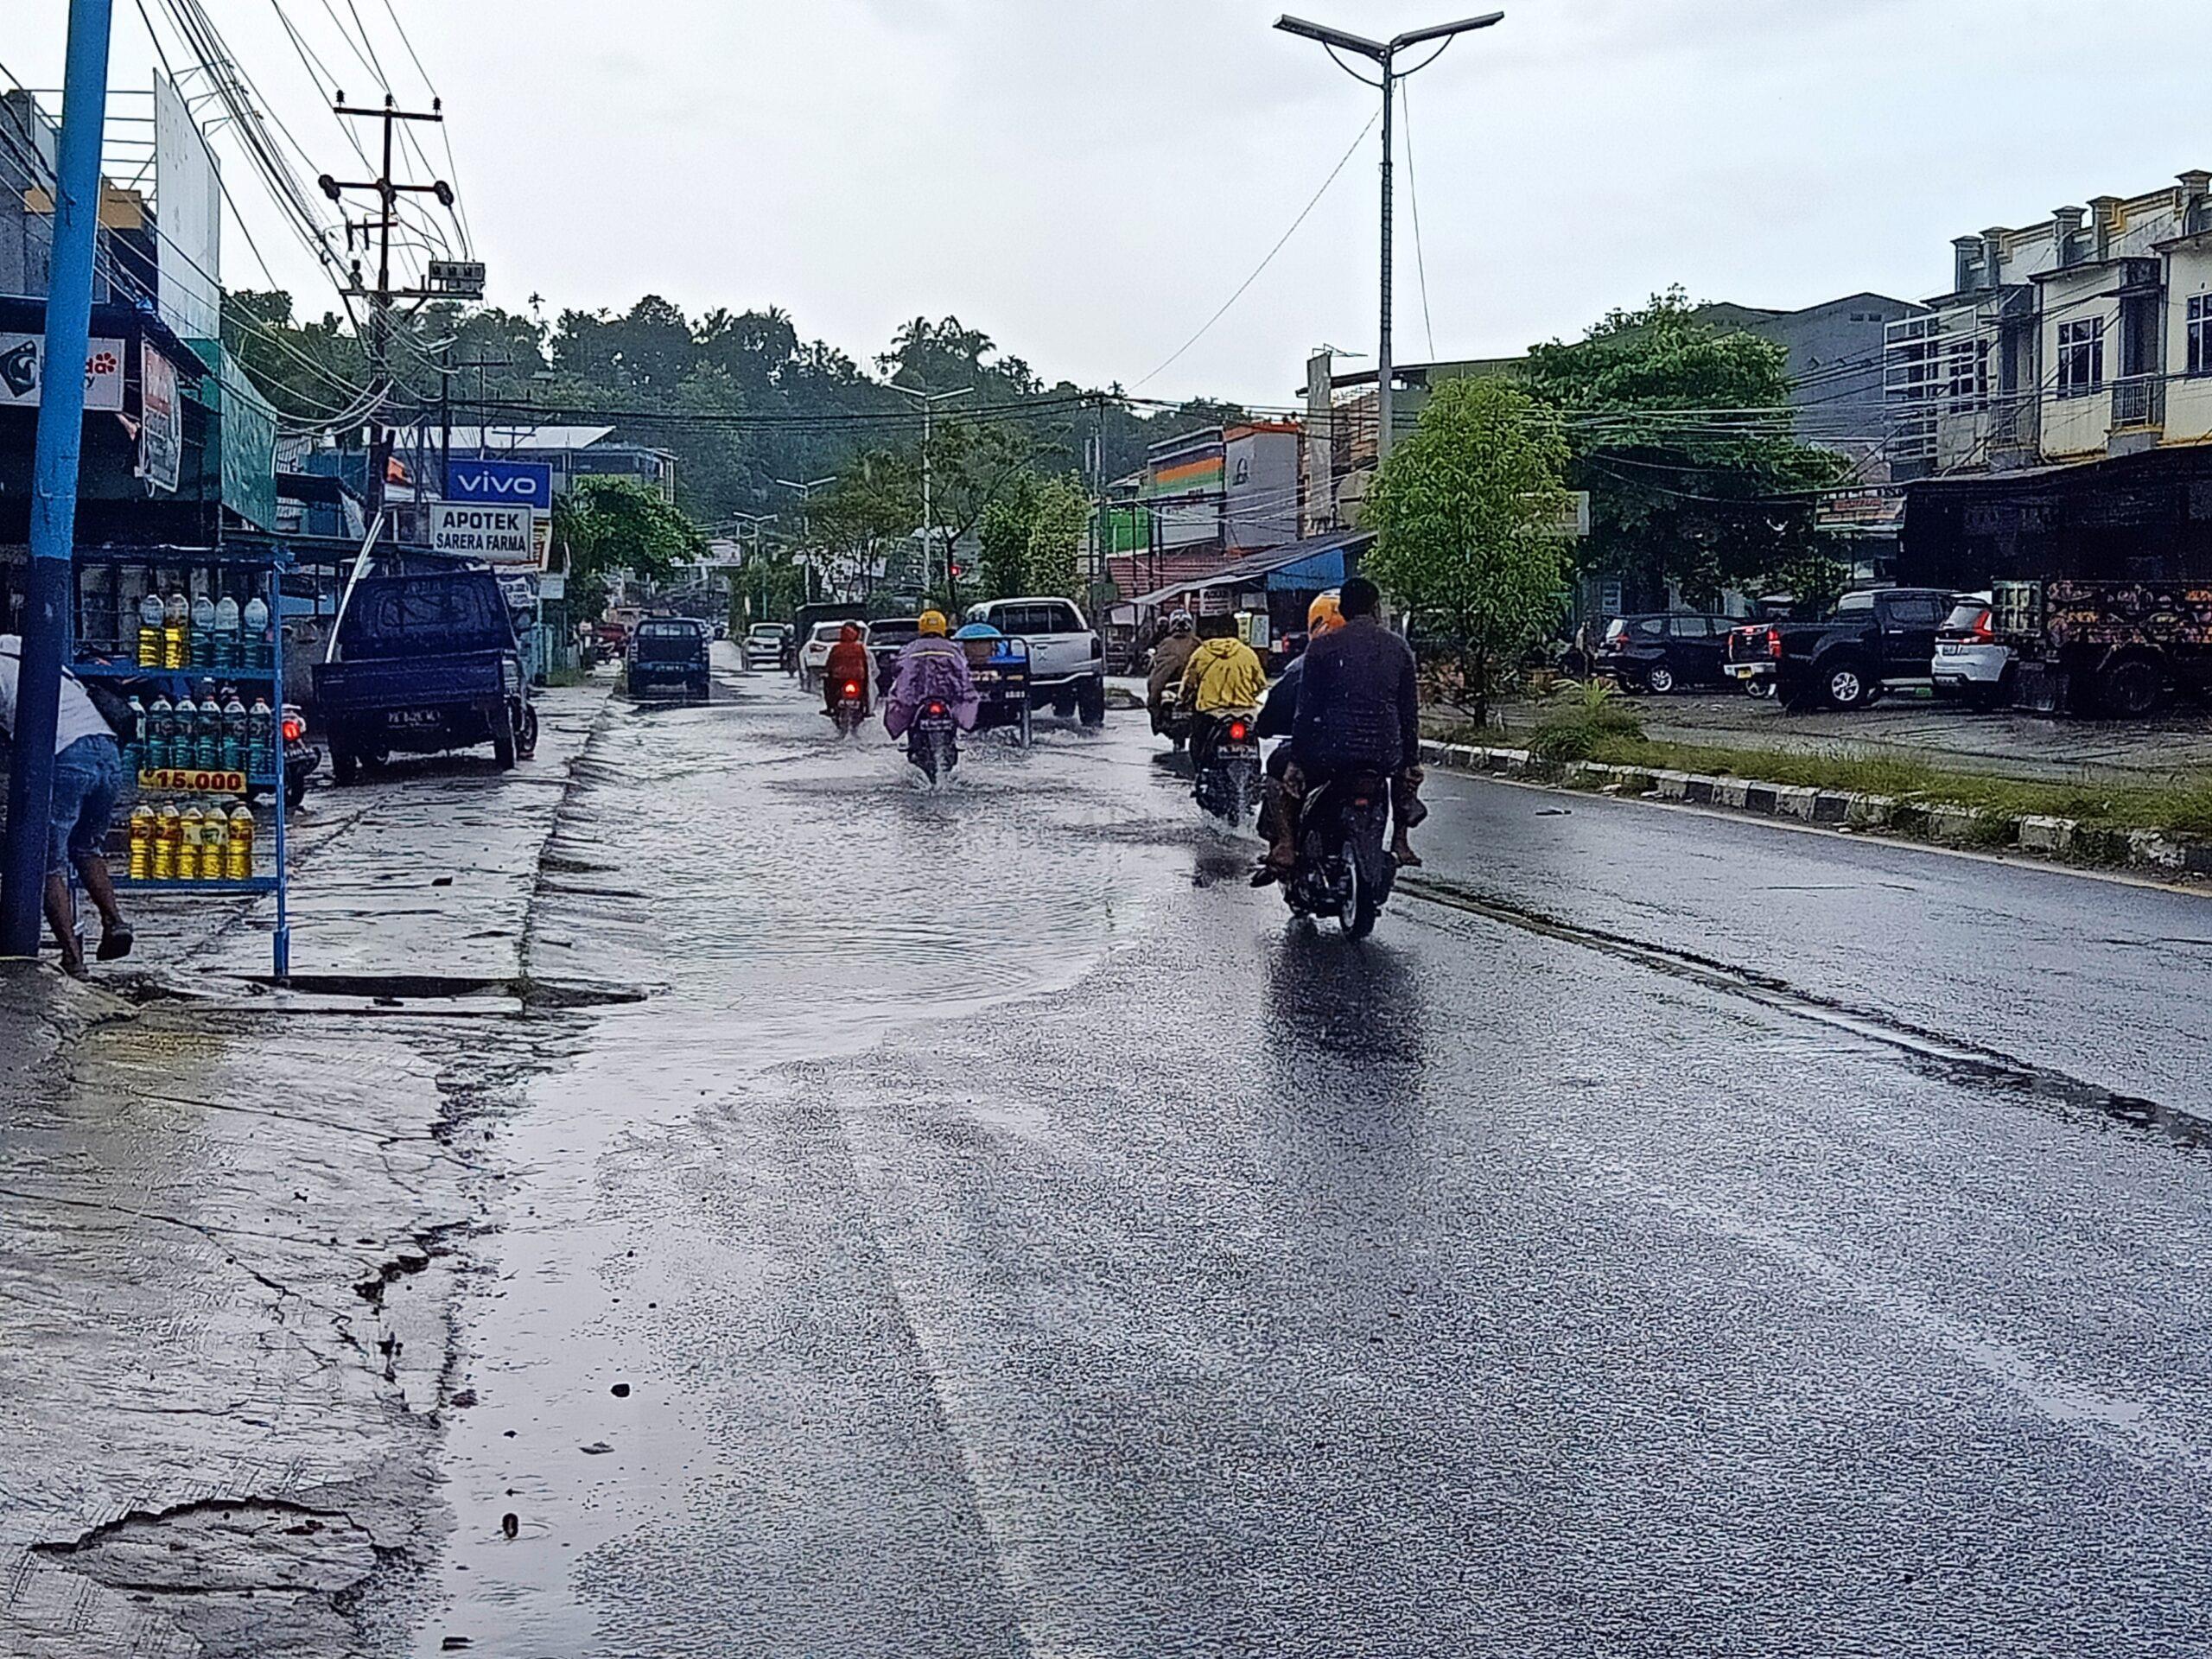 Manokwari Hujan Deras Disertai Petir dan Guntur 17 IMG 20210206 153513 scaled